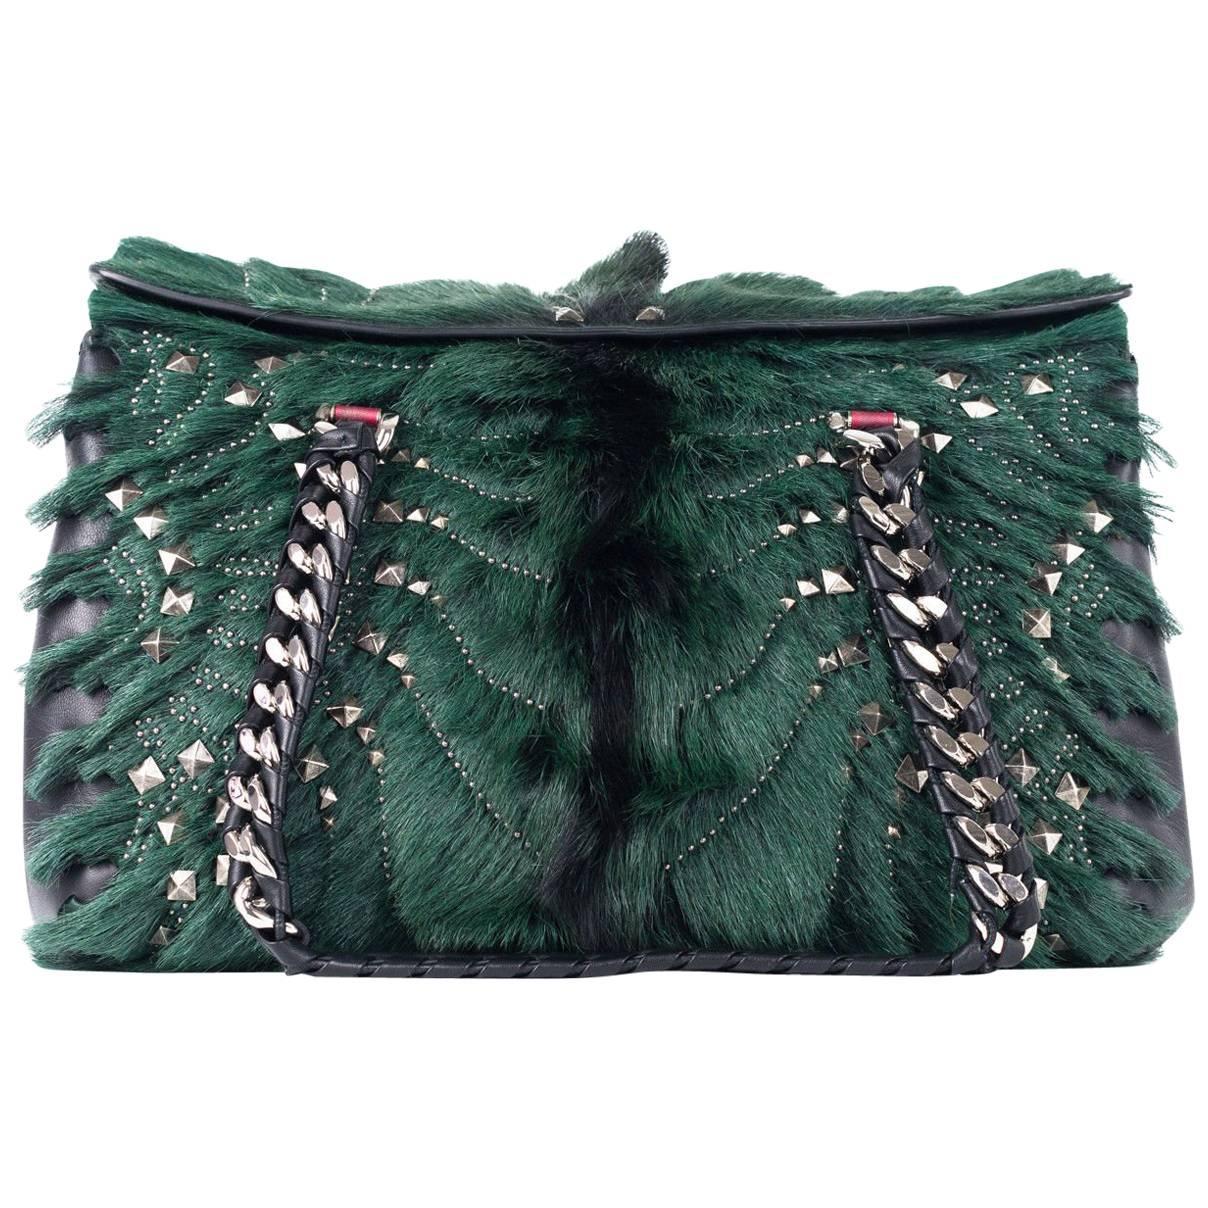 1stdibs Roberto Cavalli Regina Medium Radiant Studded Green Leather Satchel D1Yh7GehQW